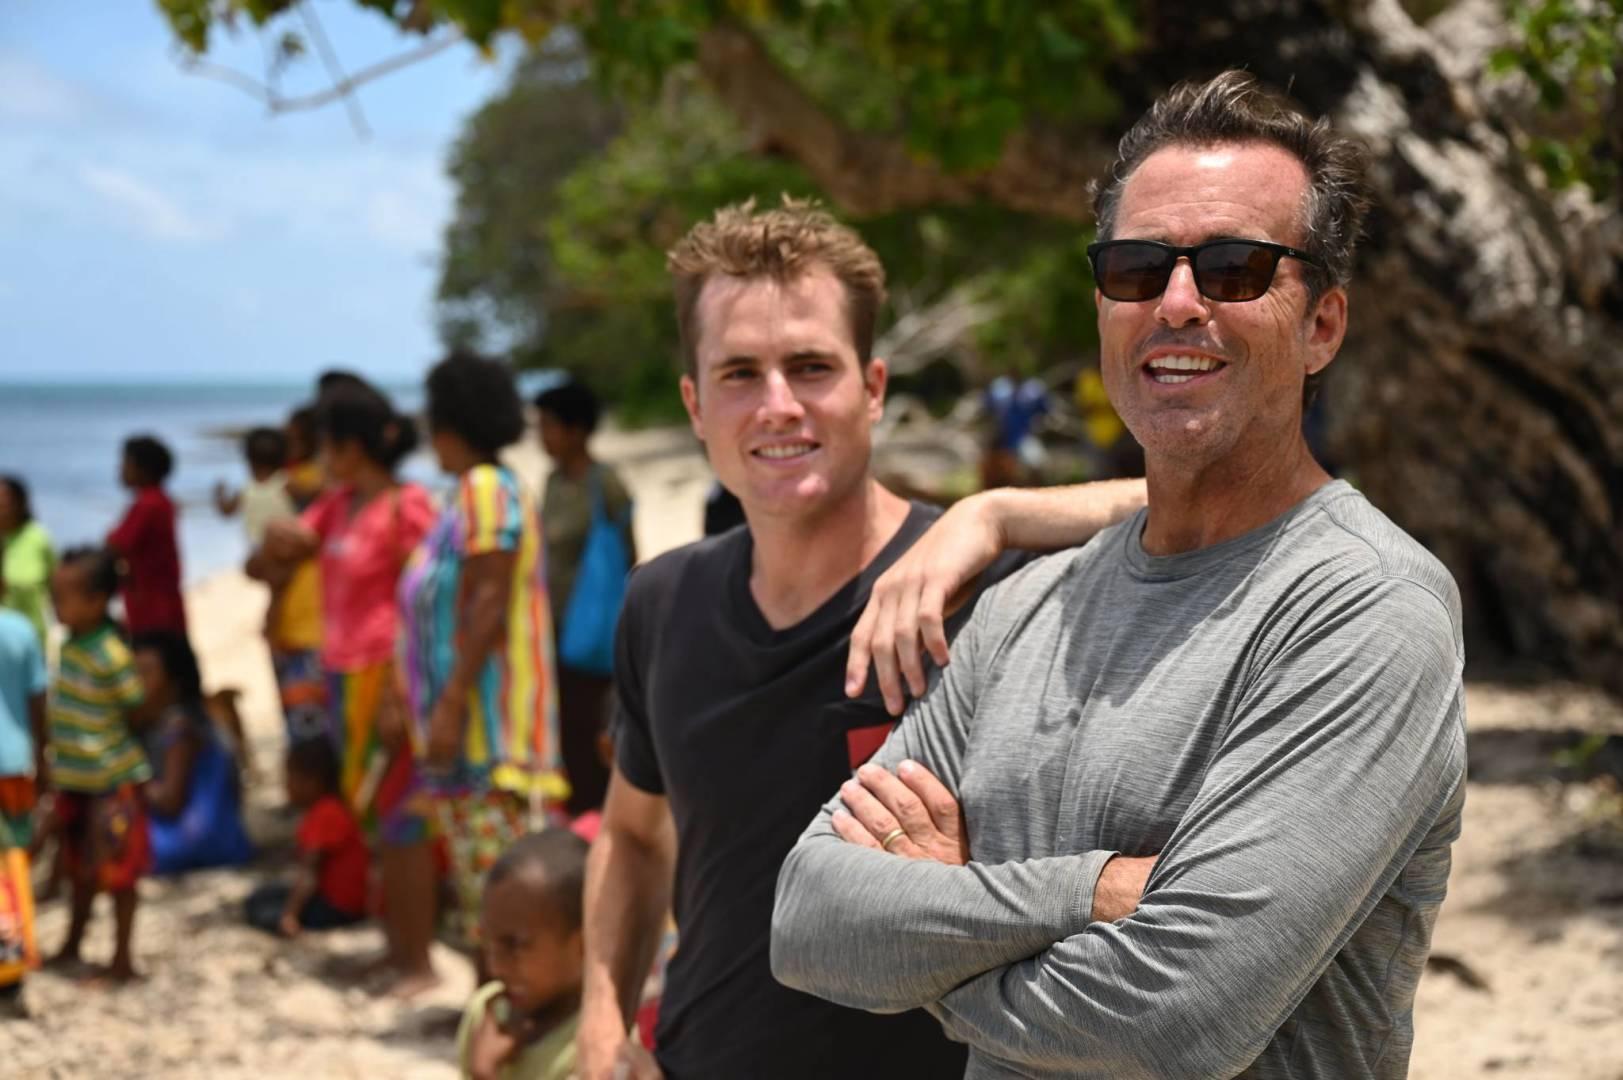 Turisti Curiosi con Bob e Mack Woodruff 4